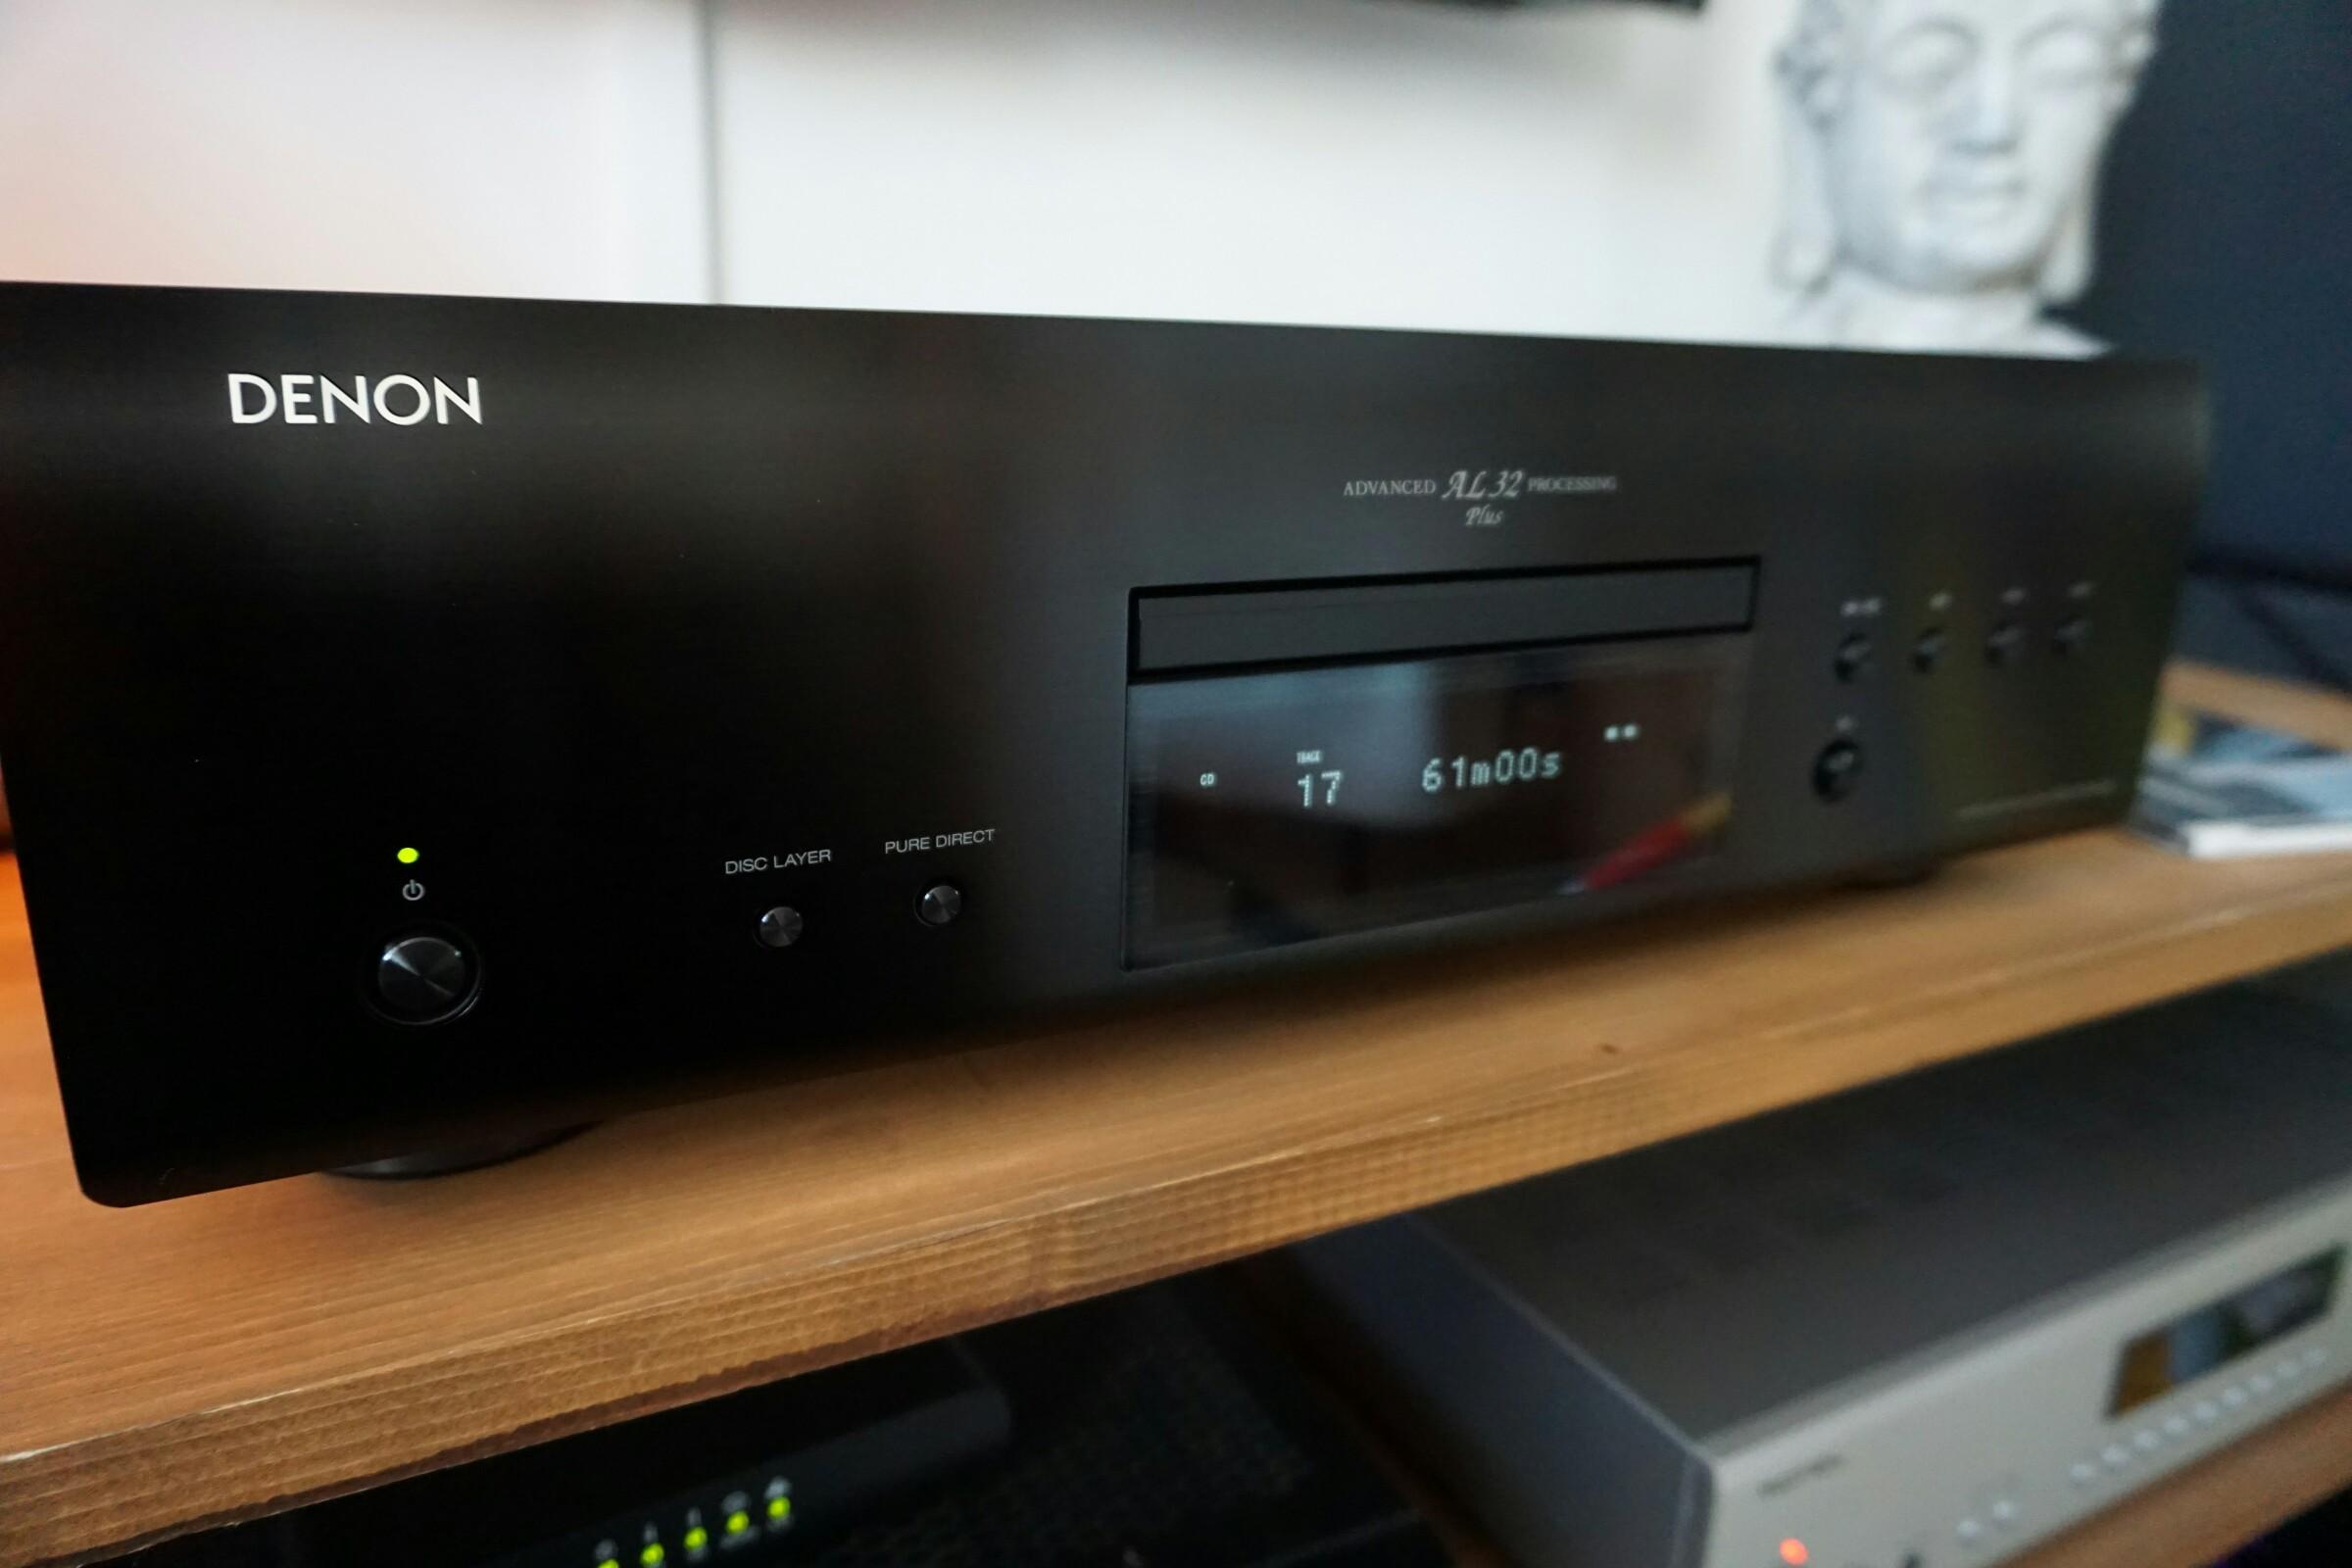 Denon DCD-1600NE CD/SACD player - AVS Forum | Home Theater